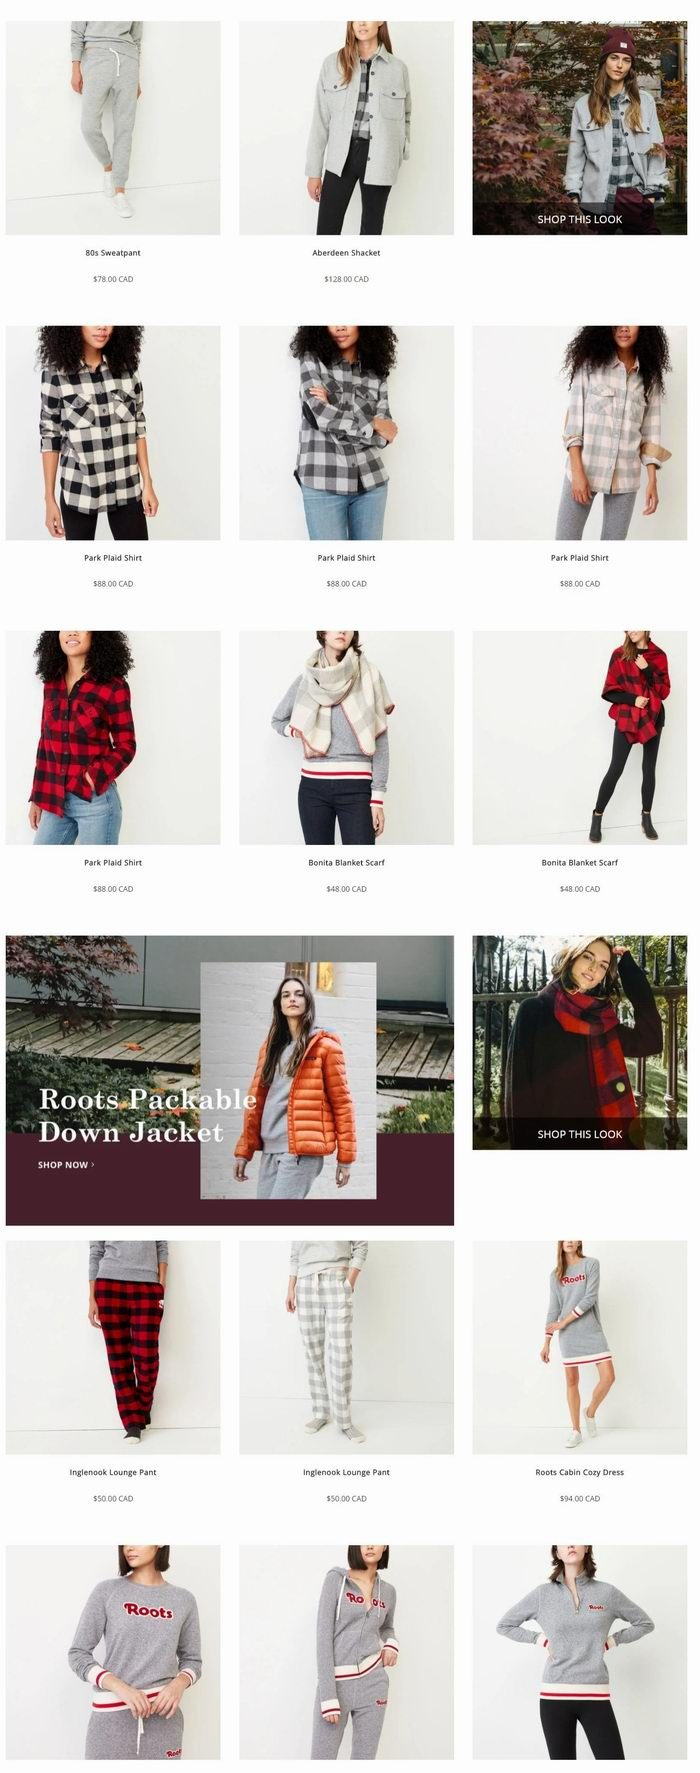 Roots全场新款服饰、鞋靴、皮包7.5折优惠,特卖区4折起+额外7.5折!